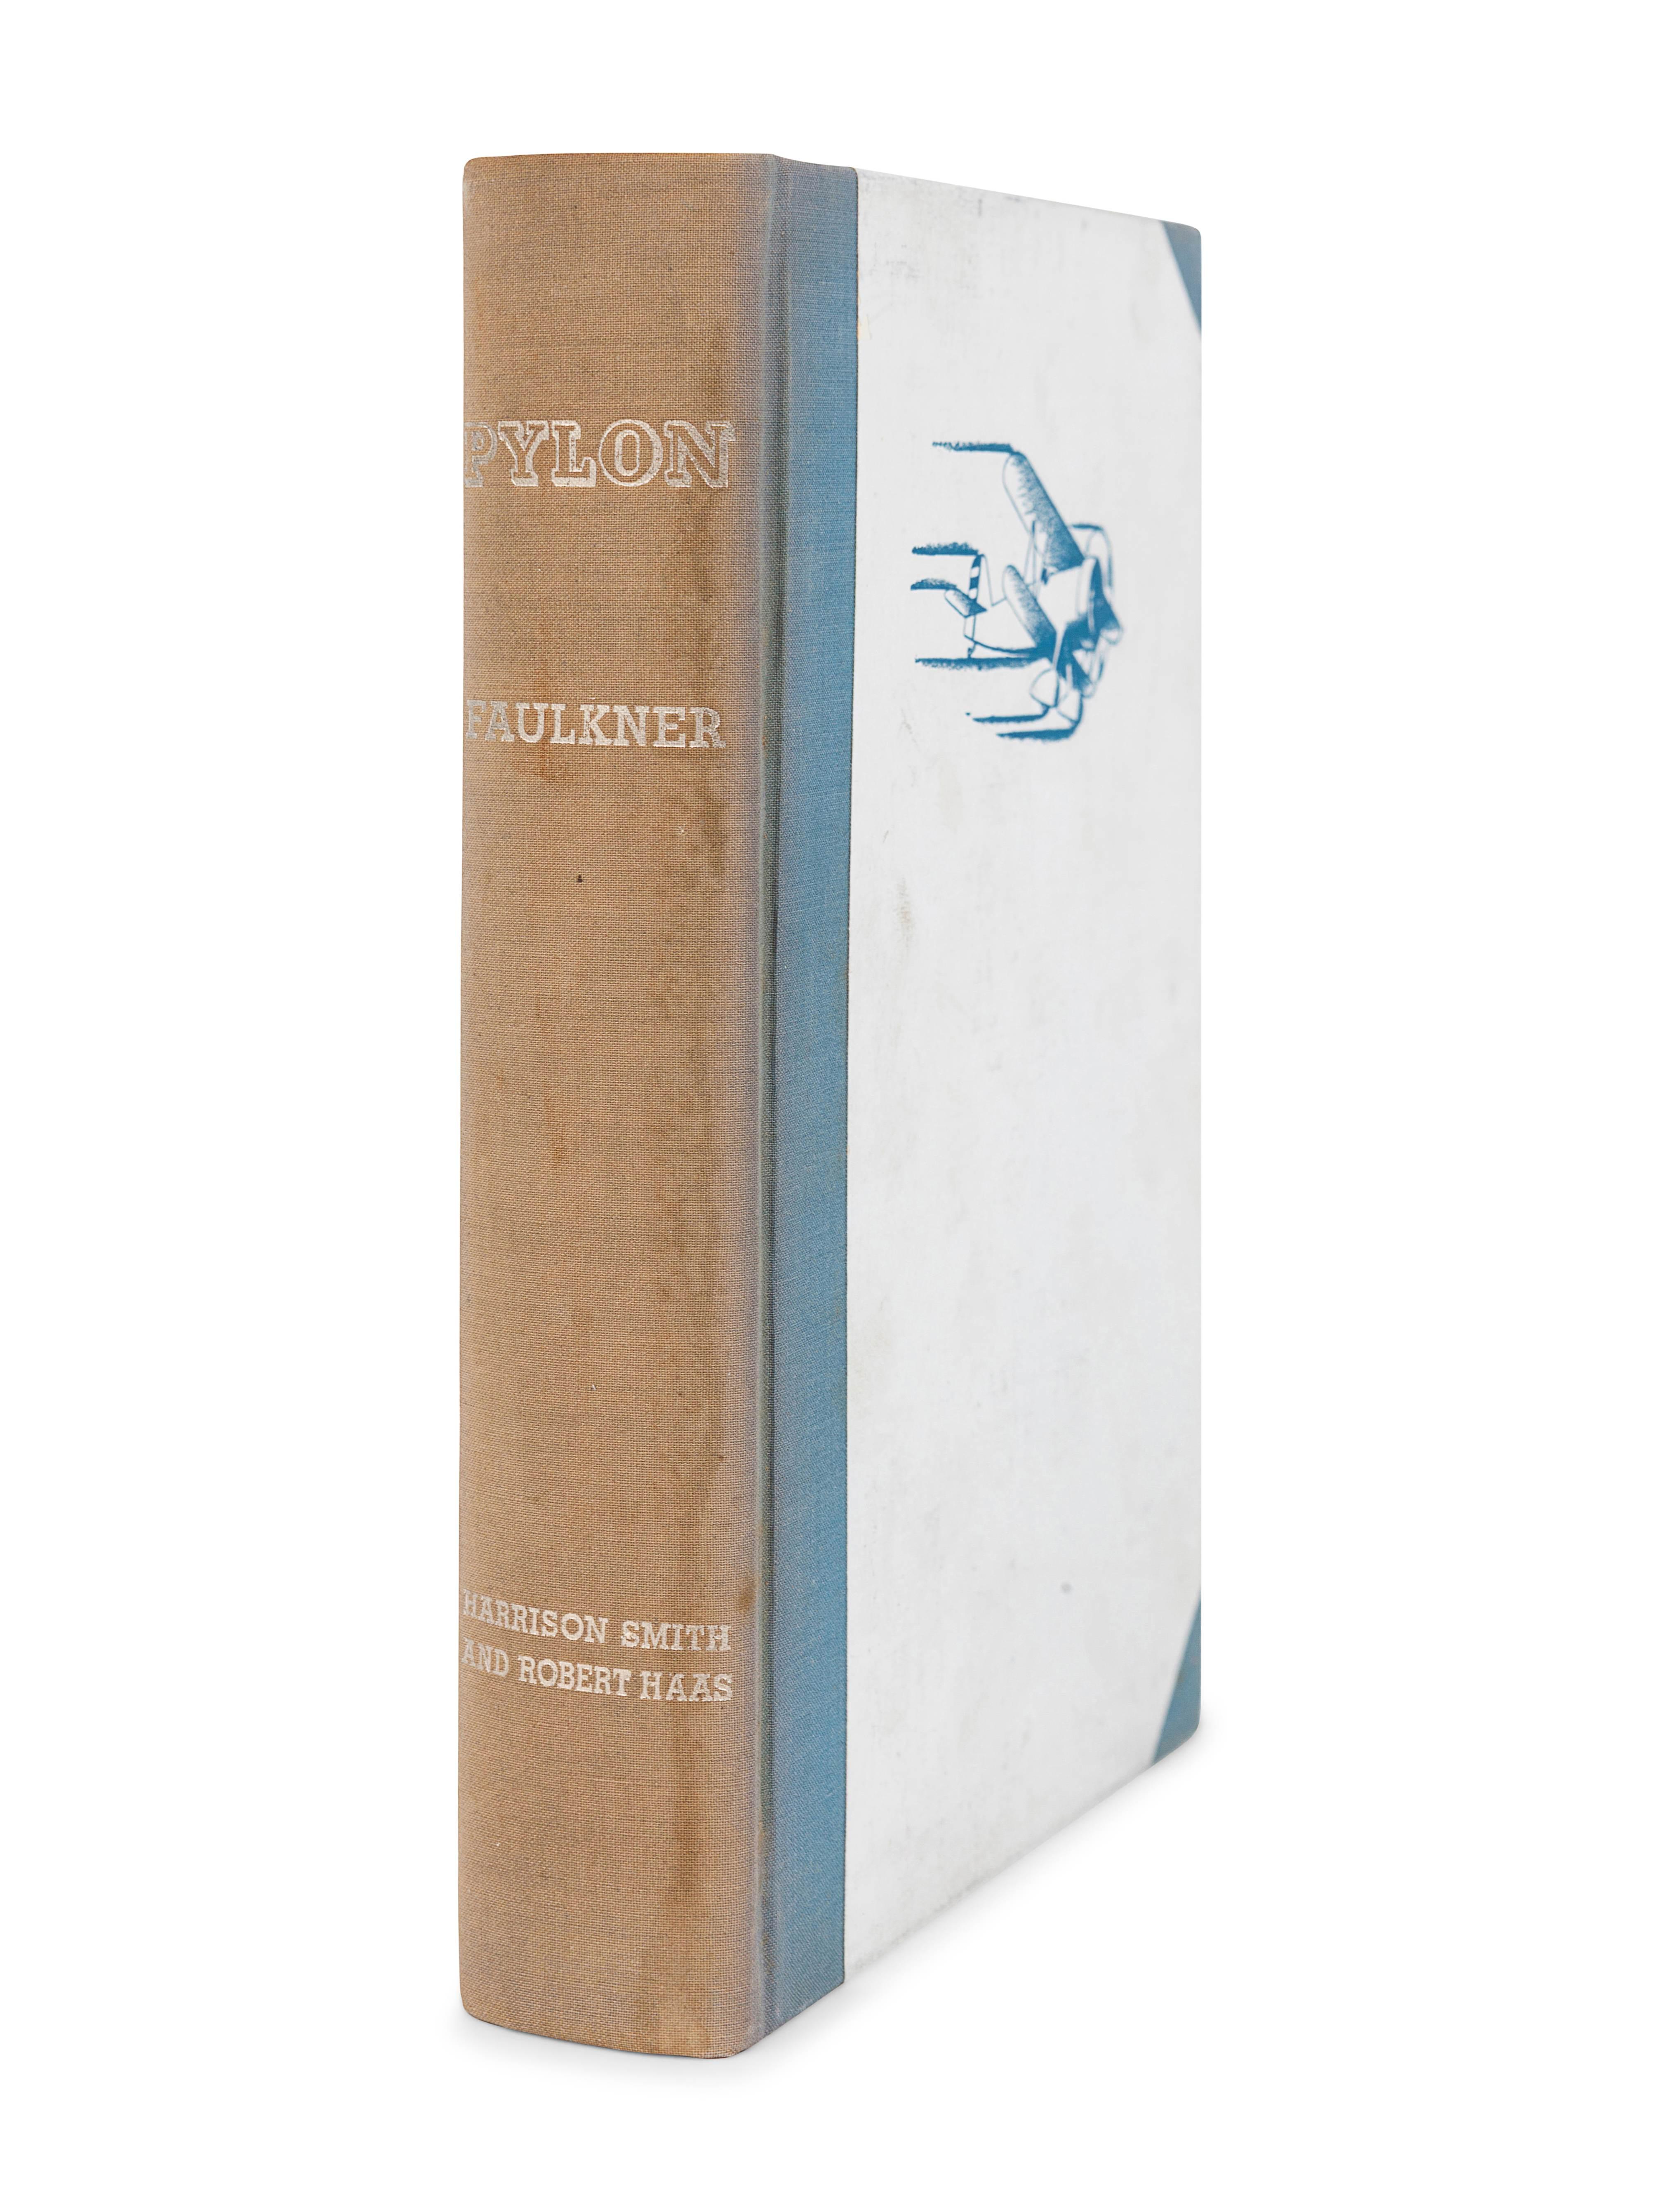 FAULKNER, William (1897-1962). Pylon. New York: Harrison Smith and Robert Haas, 1935. - Image 3 of 3